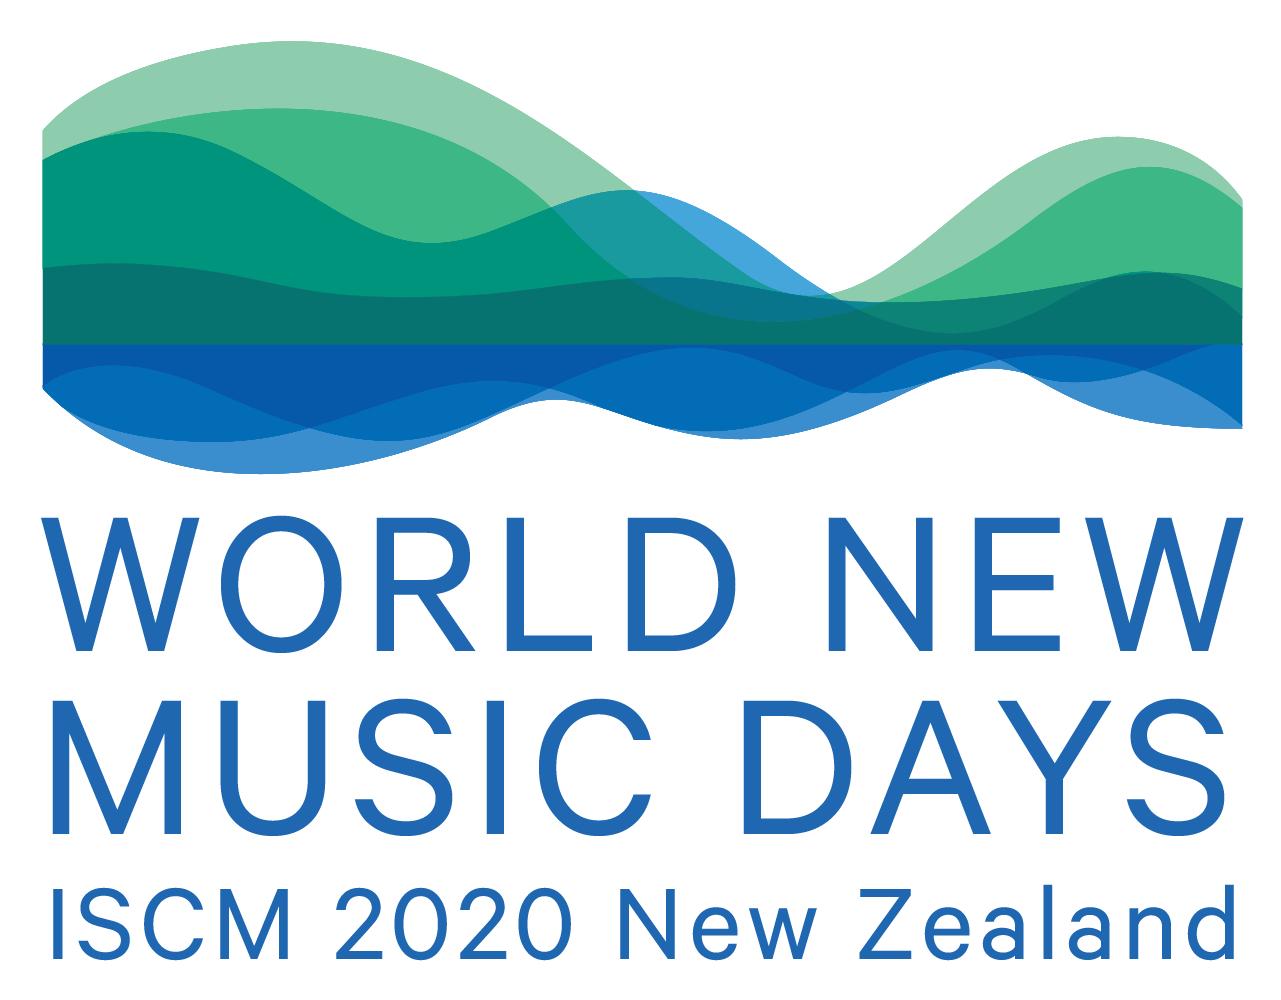 music and ecology, iscm, nieuw zeeland – lezing